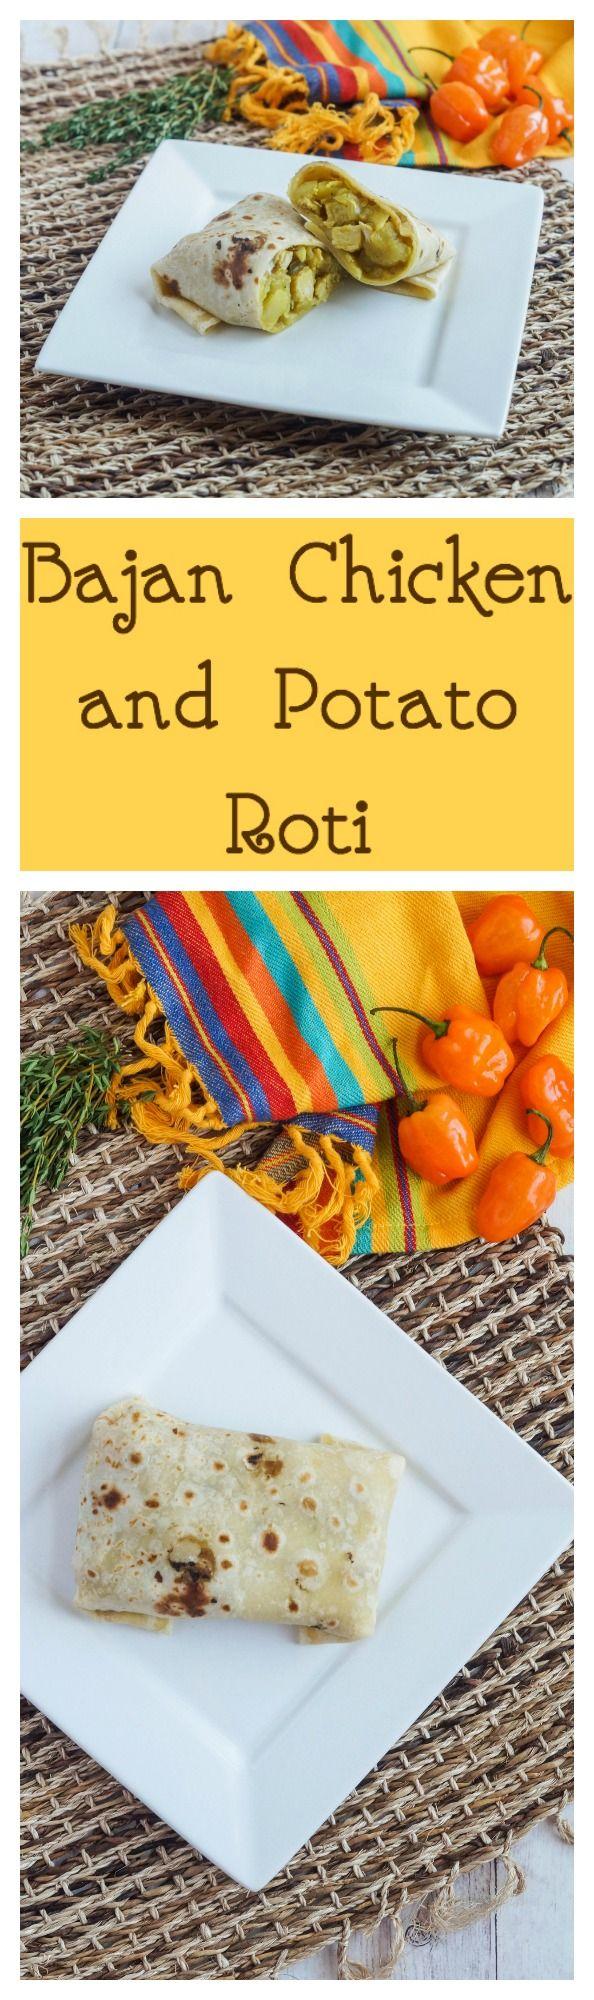 Bajan Chicken and Potato Roti  #bajan #barbados #chicken #poultry #potato #roti #wrap #carnival #curry